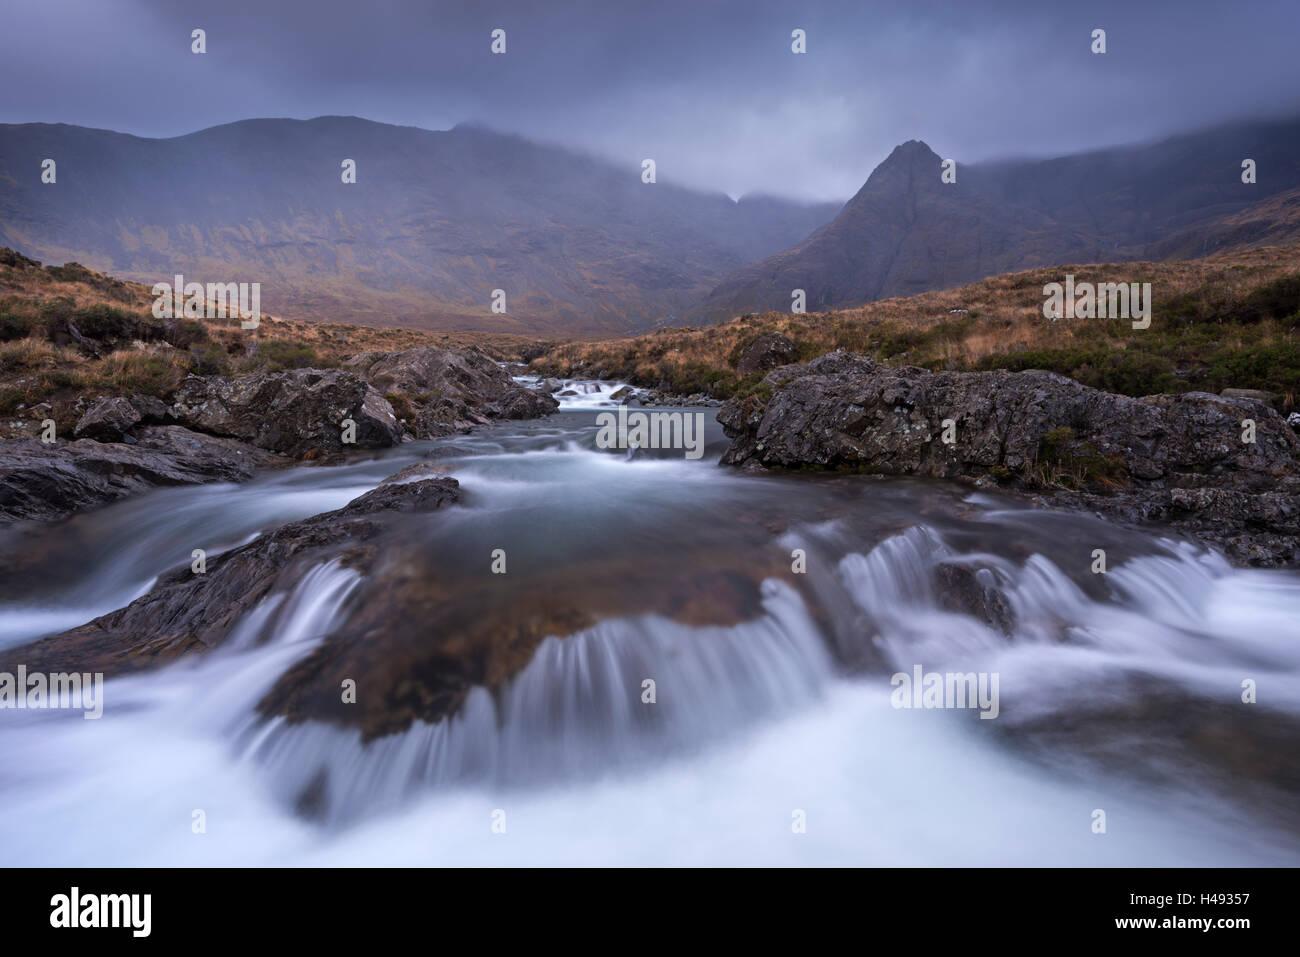 The Fairy Pools beneath the Cuillin Hills mountain range, Isle of Skye, Scotland. Winter (December) 2013. - Stock Image